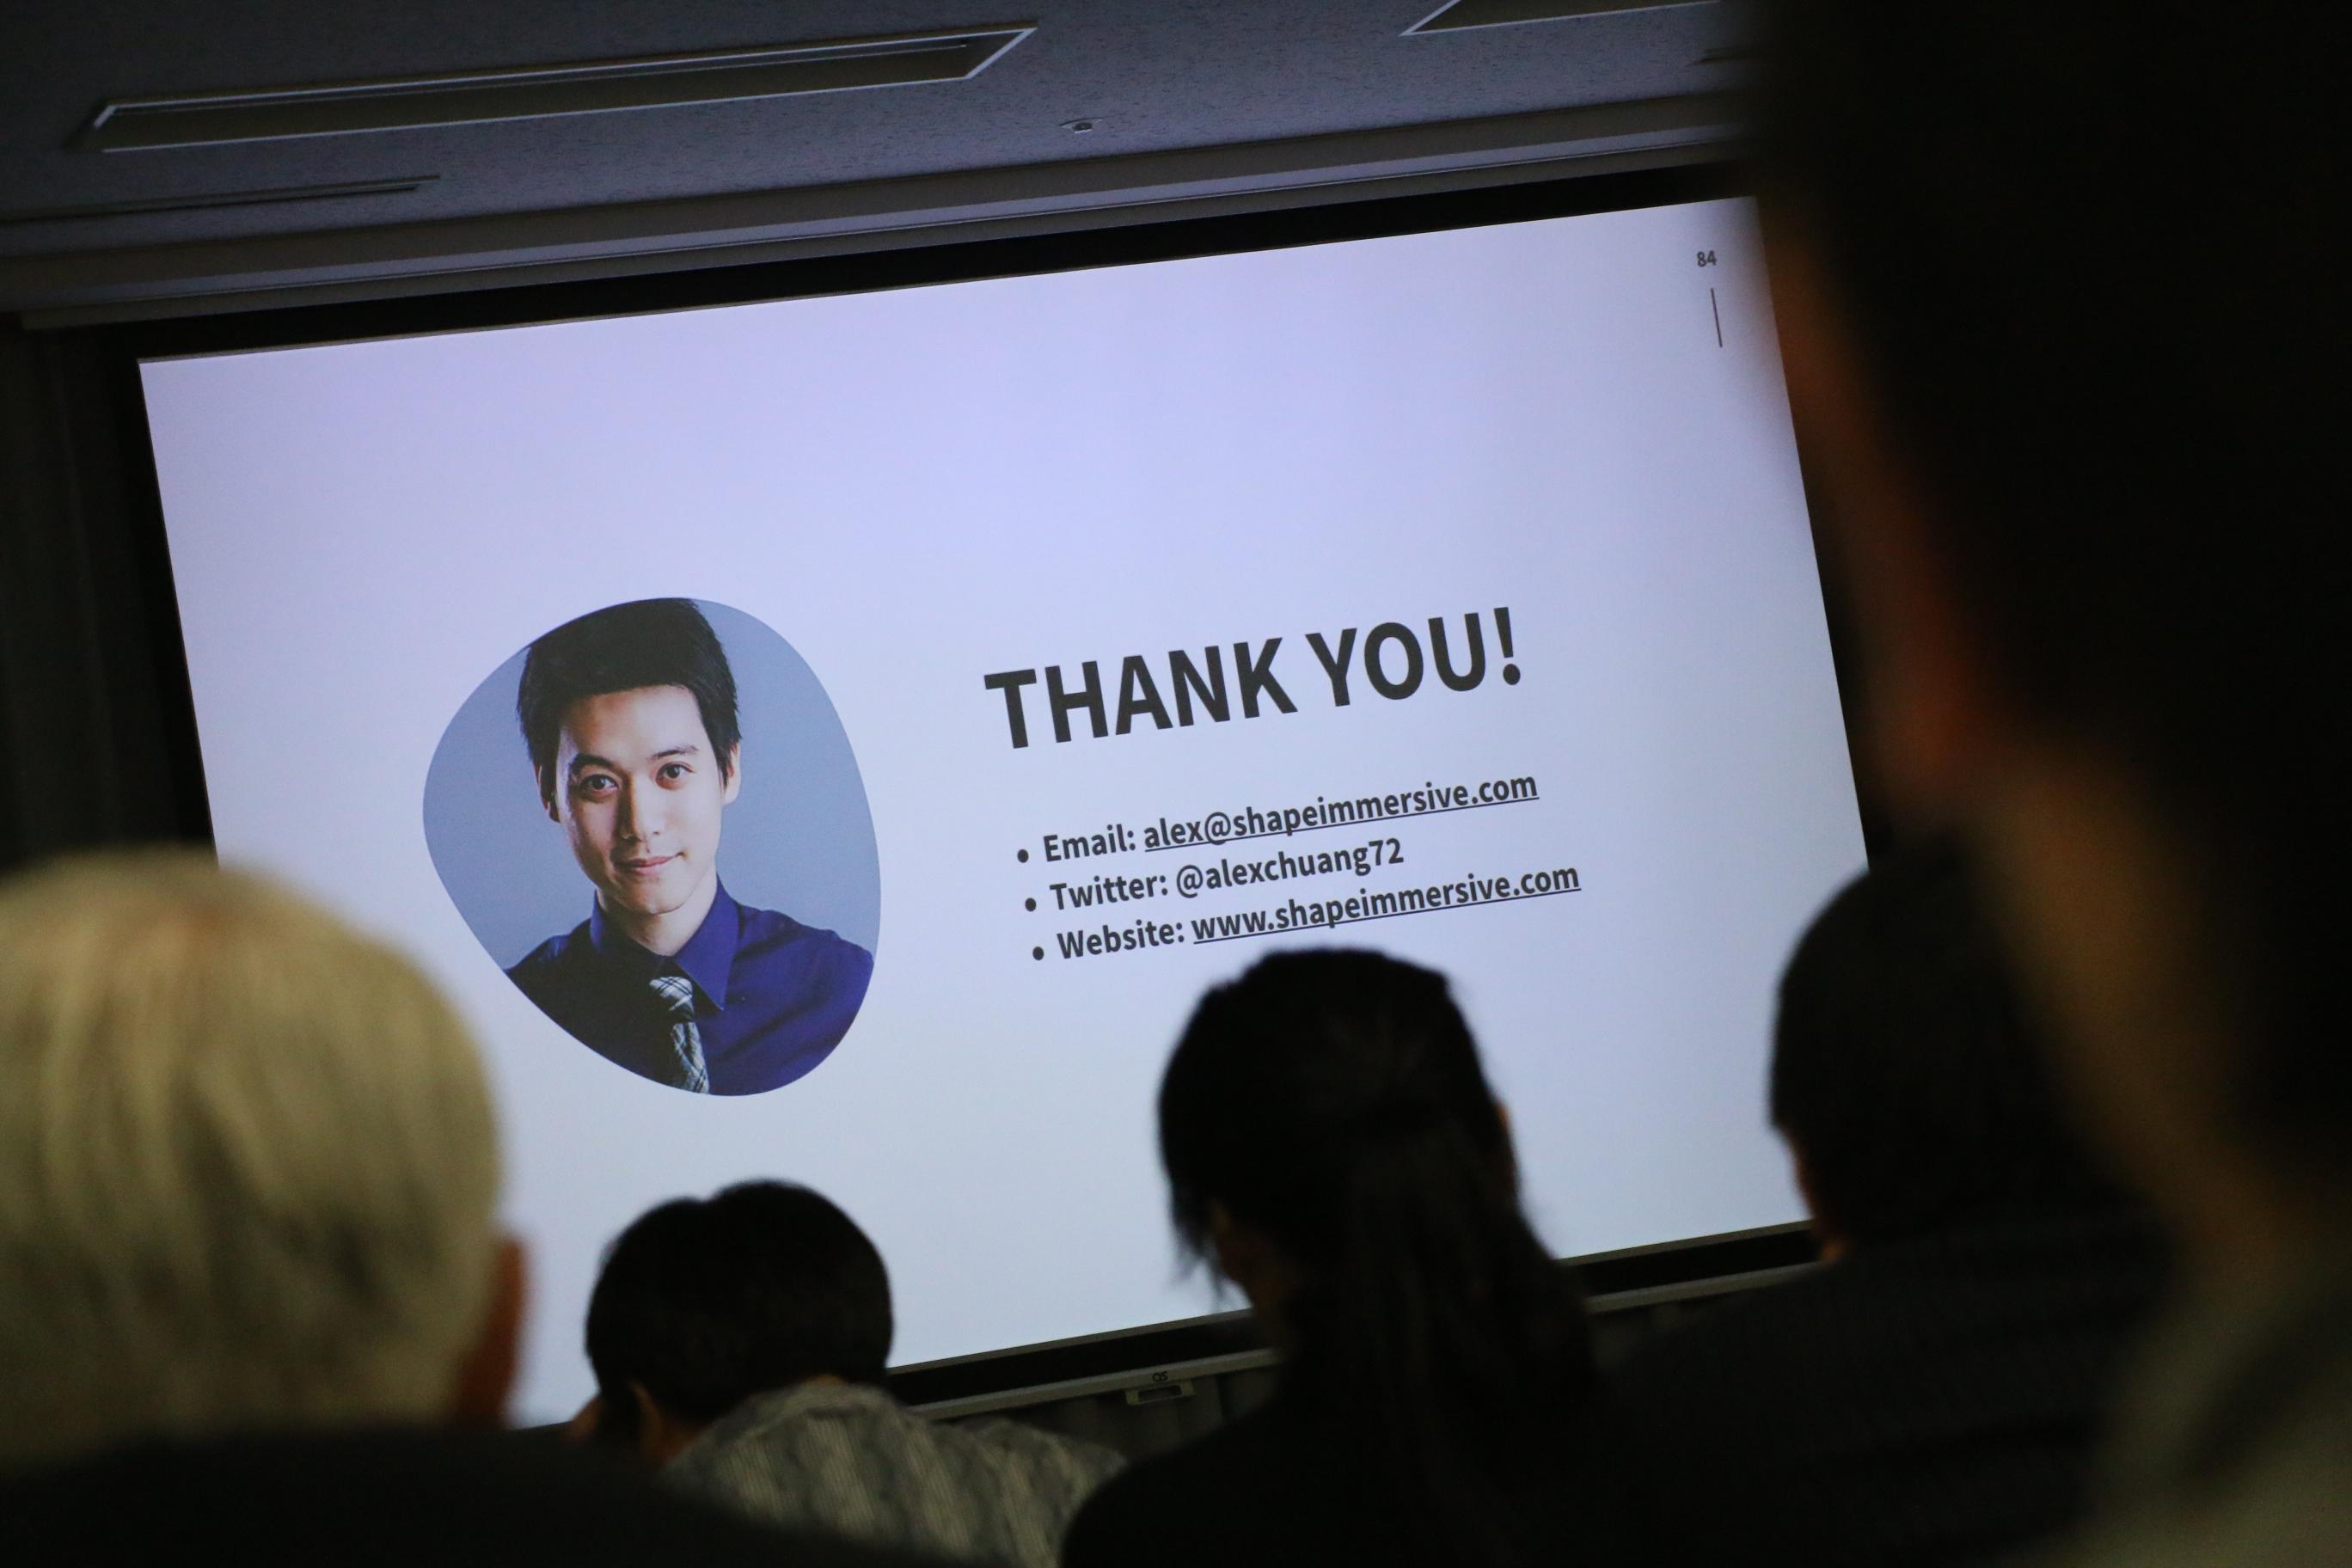 NoMapsセミナー「xRが世界を変える!可能性と将来展望 ~HMCCセッション~」開催報告